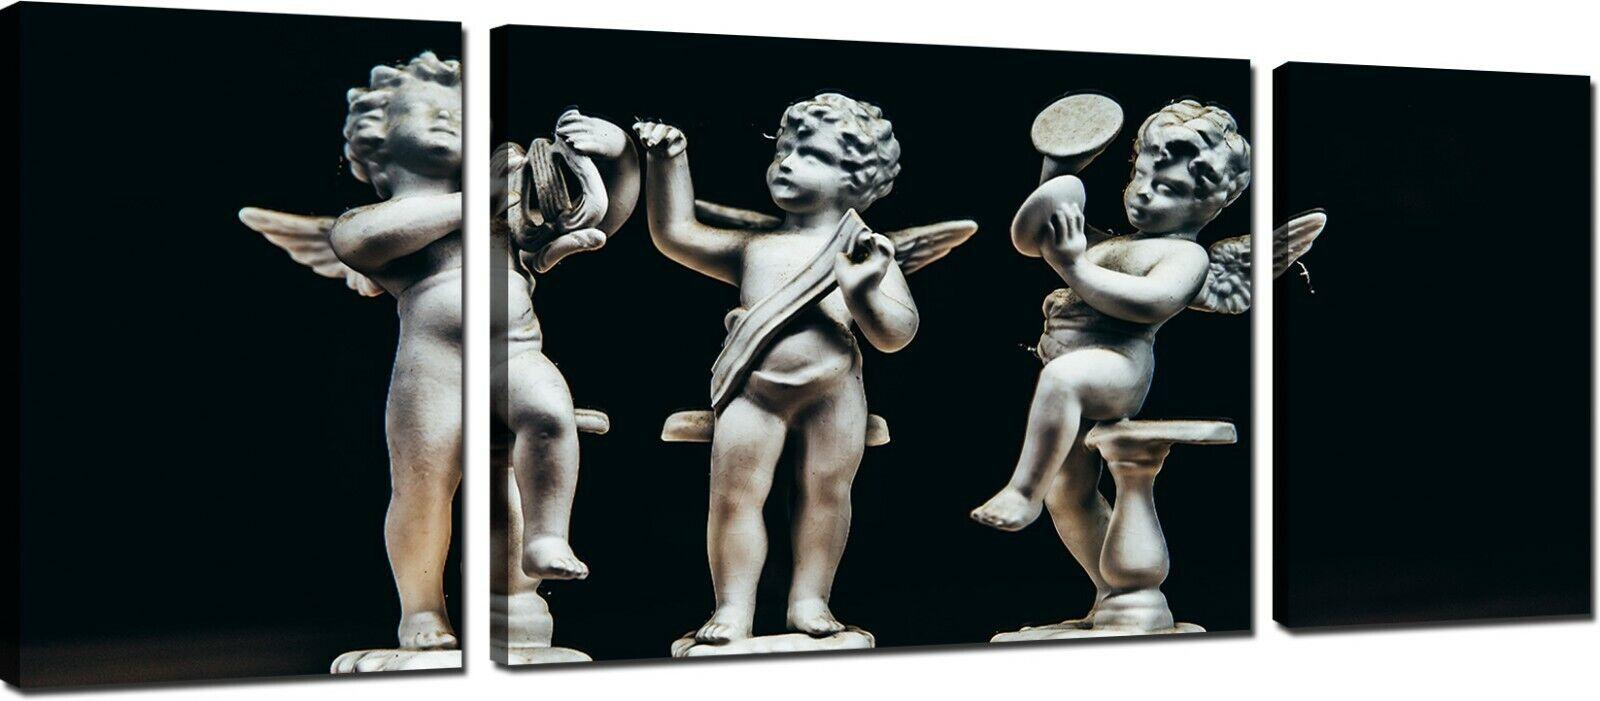 Quadri Moderni Stampa su Tela Canvas Cm 208x70 Quadro Quadro Quadro Moderno 3 Pezzi XXL Arte 166f69